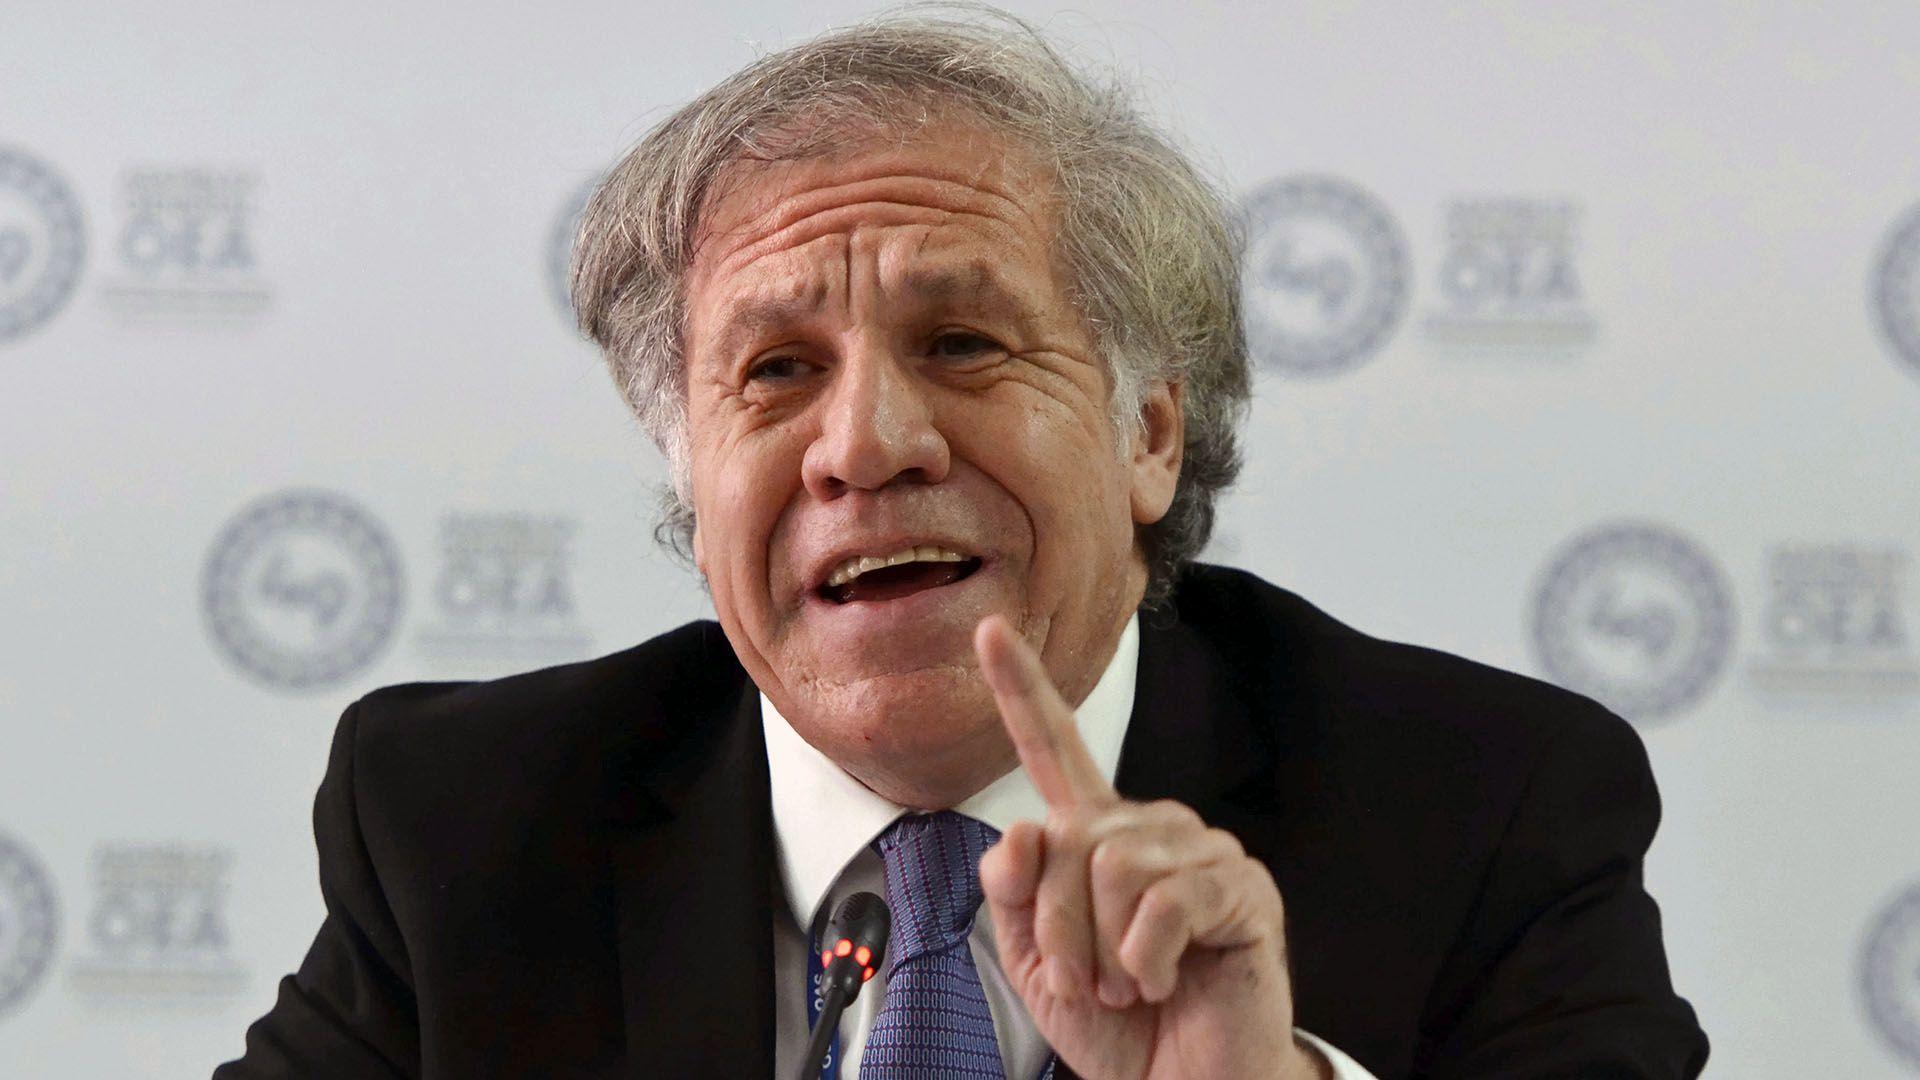 Luis Almagro (AP Photo/Luis Benavides)